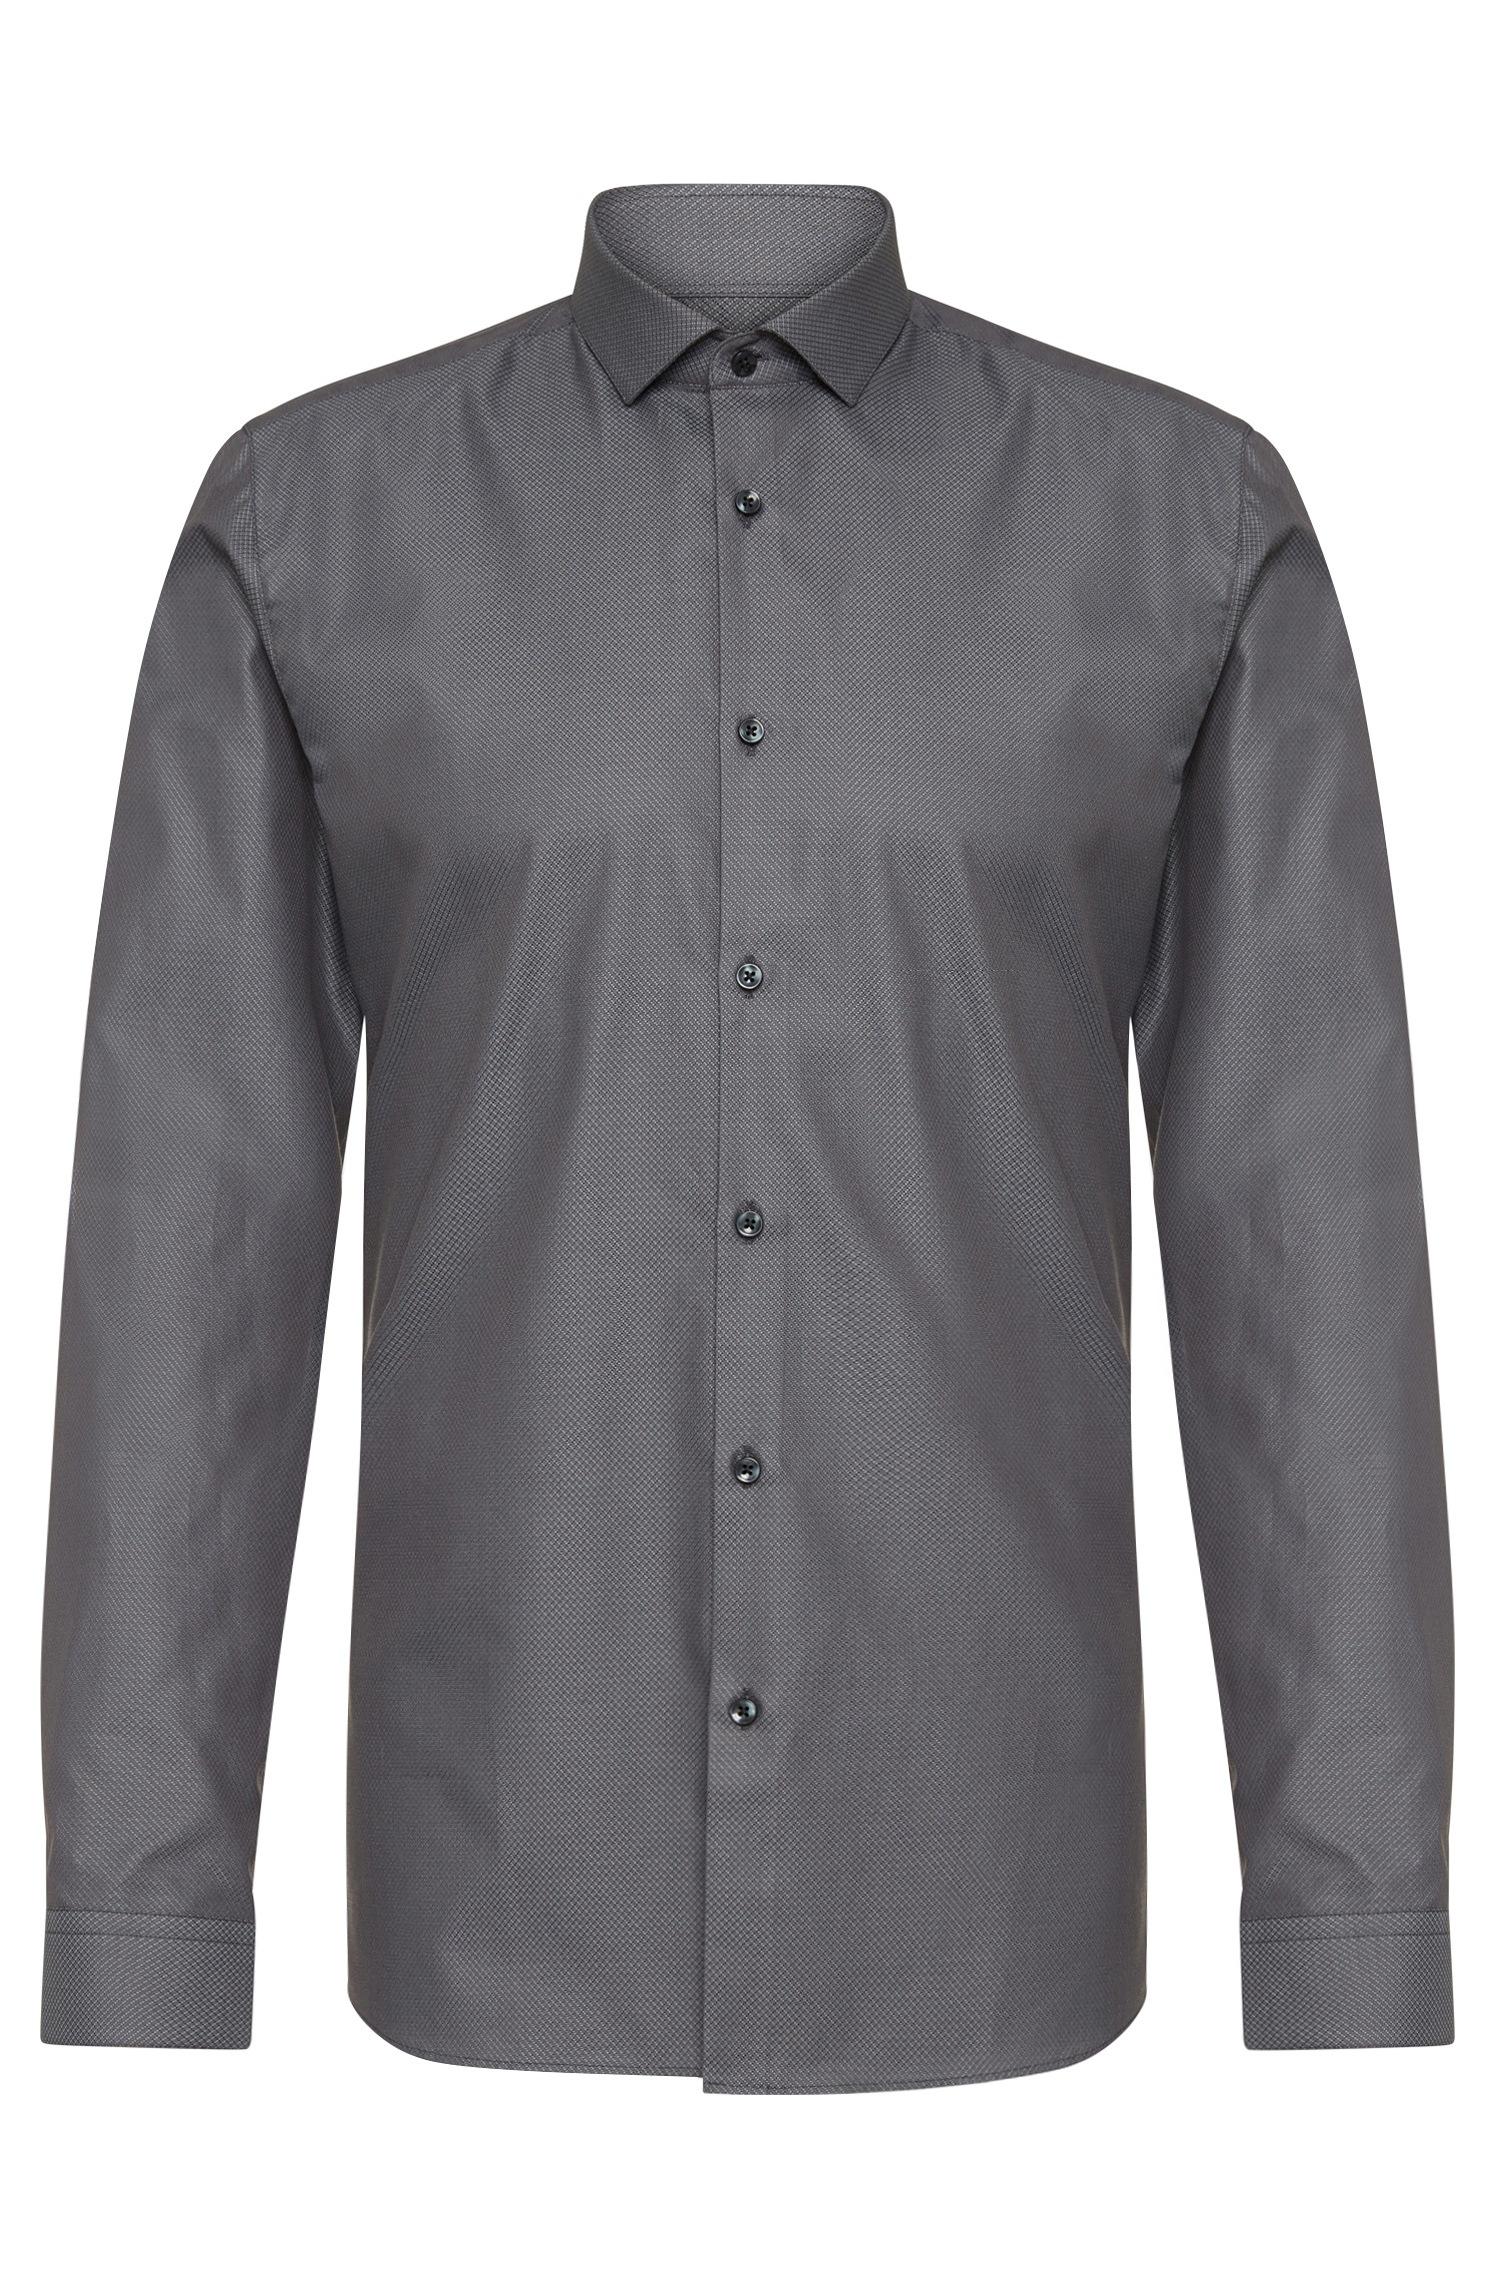 Hugo Slim Fit Shirt In Cotton 39 Erondo 39 In Gray For Men